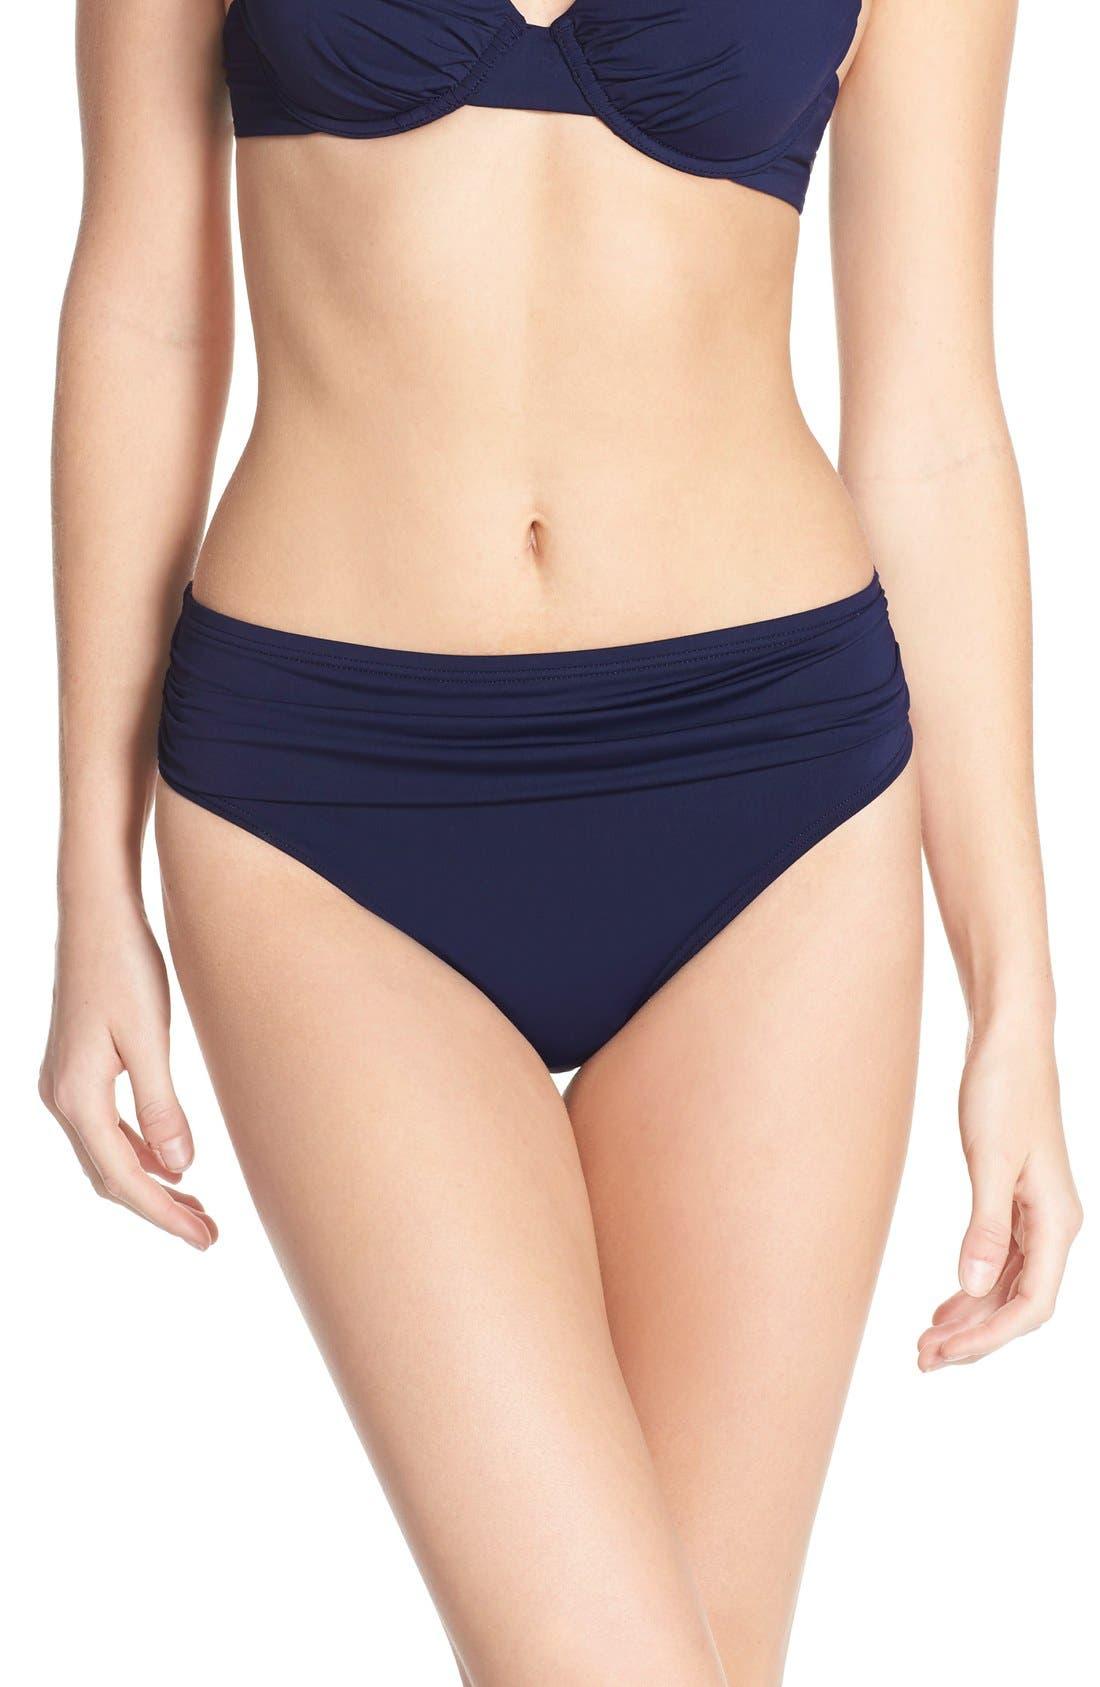 Main Image - Tommy Bahama 'Pearl' High Waist Bikini Bottoms